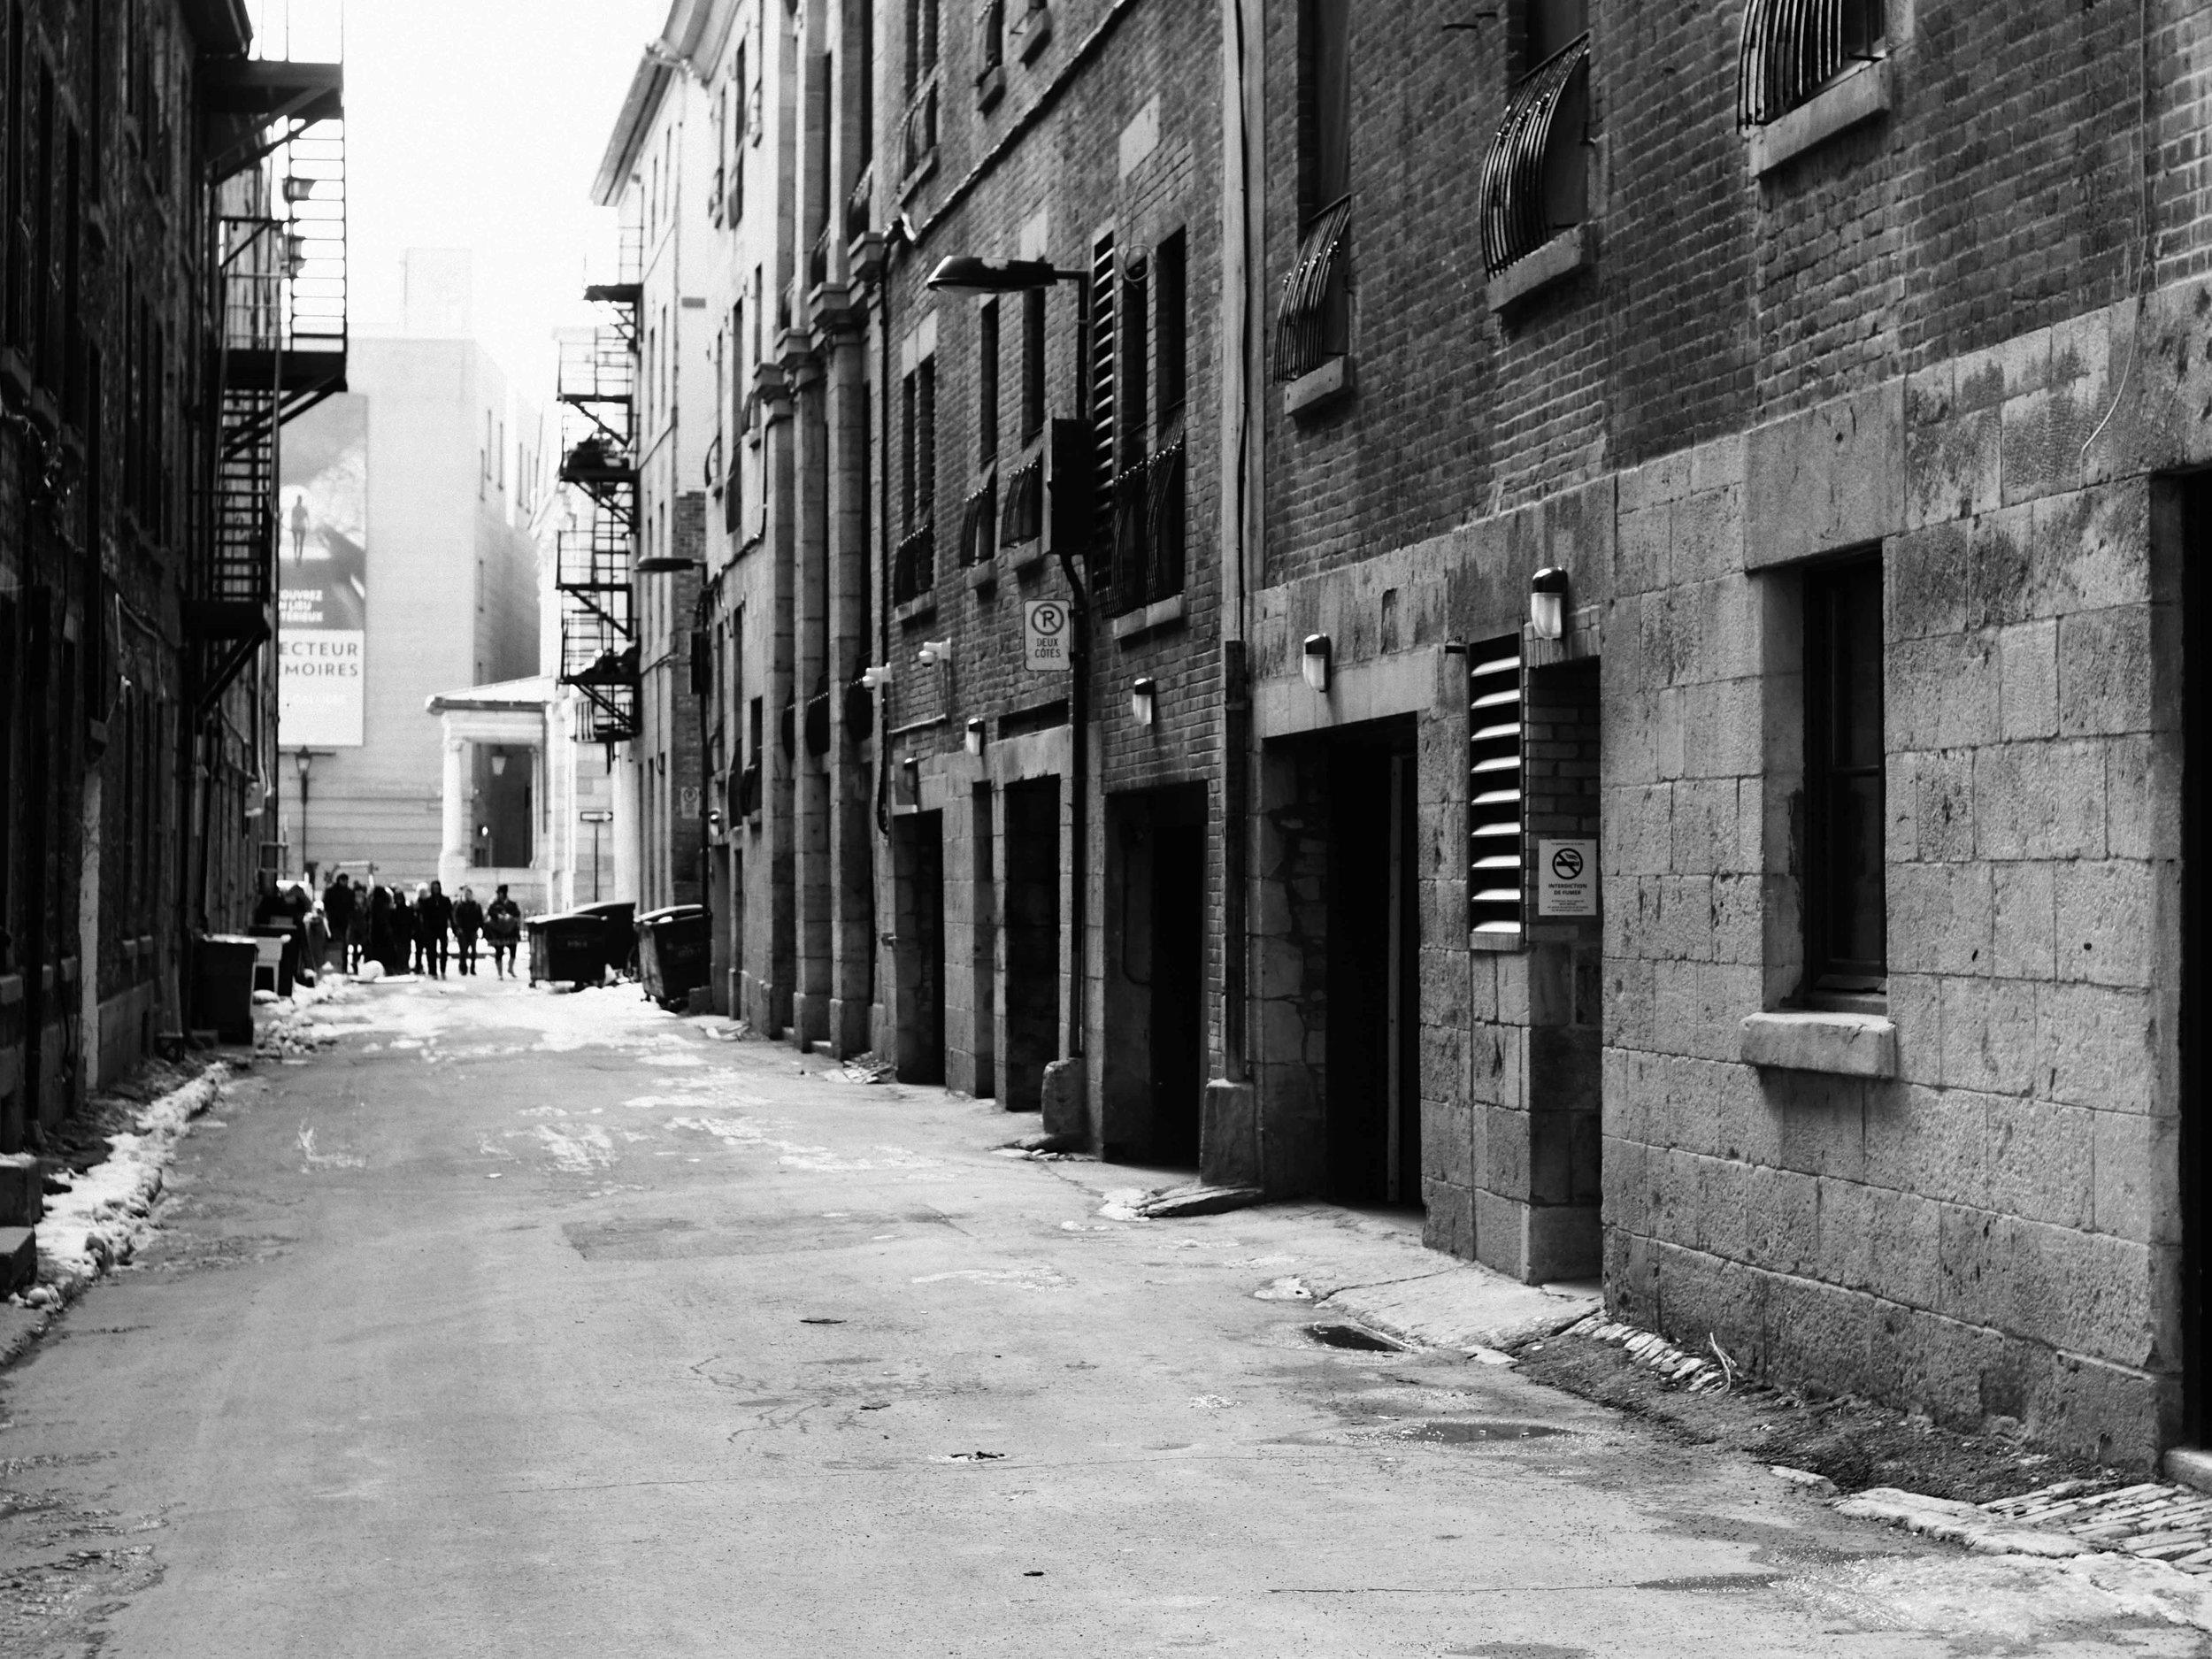 lenoxshotit montreal street photography 2018